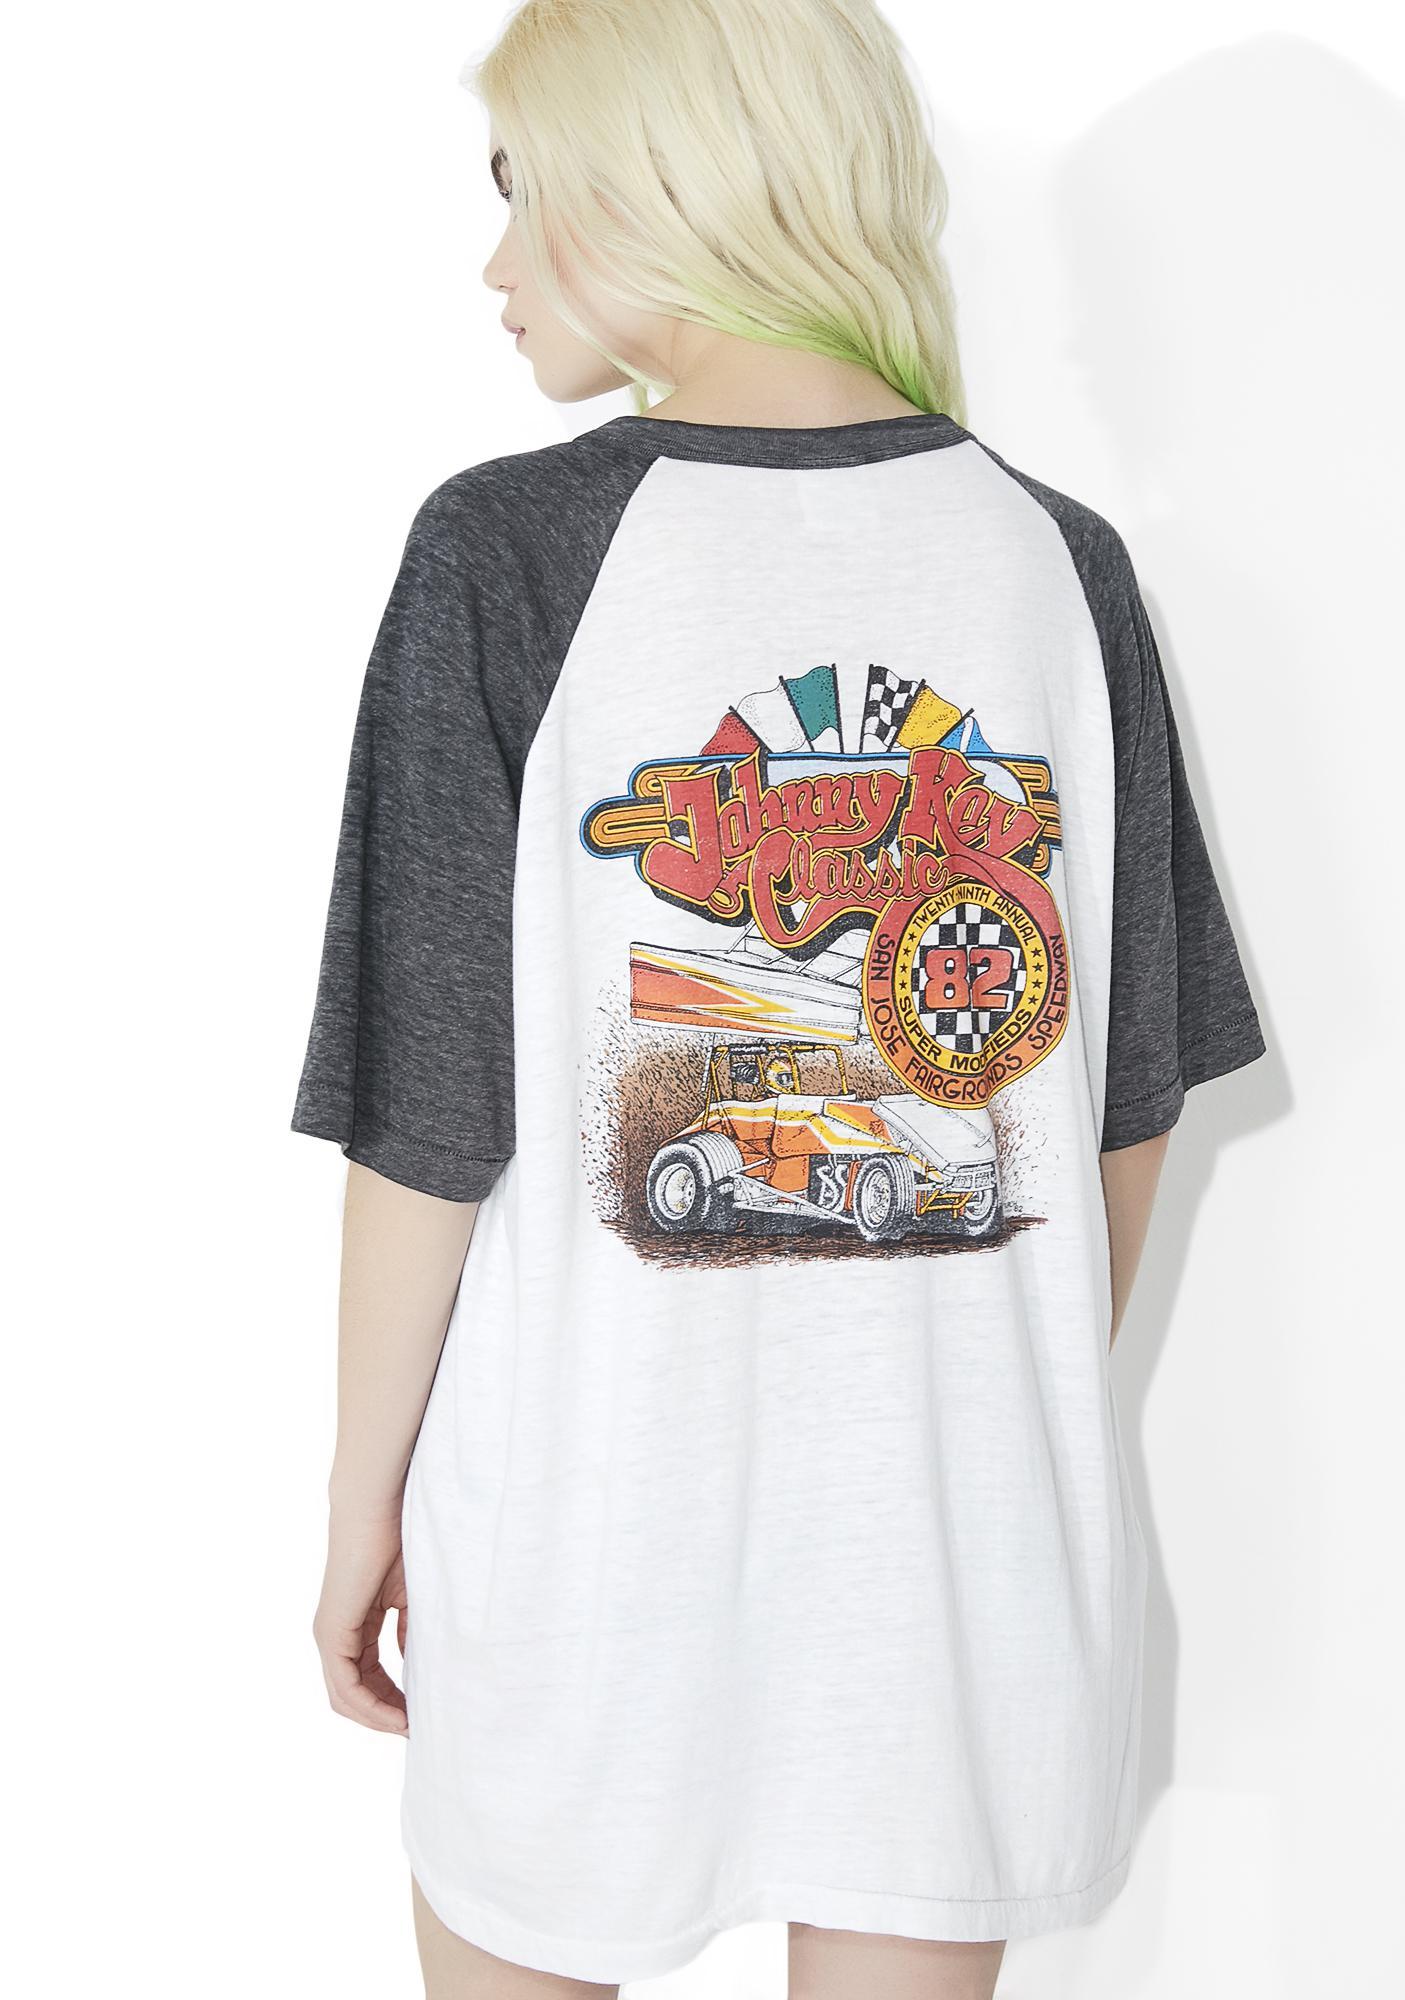 Vintage Johnny Key Racing Raglan